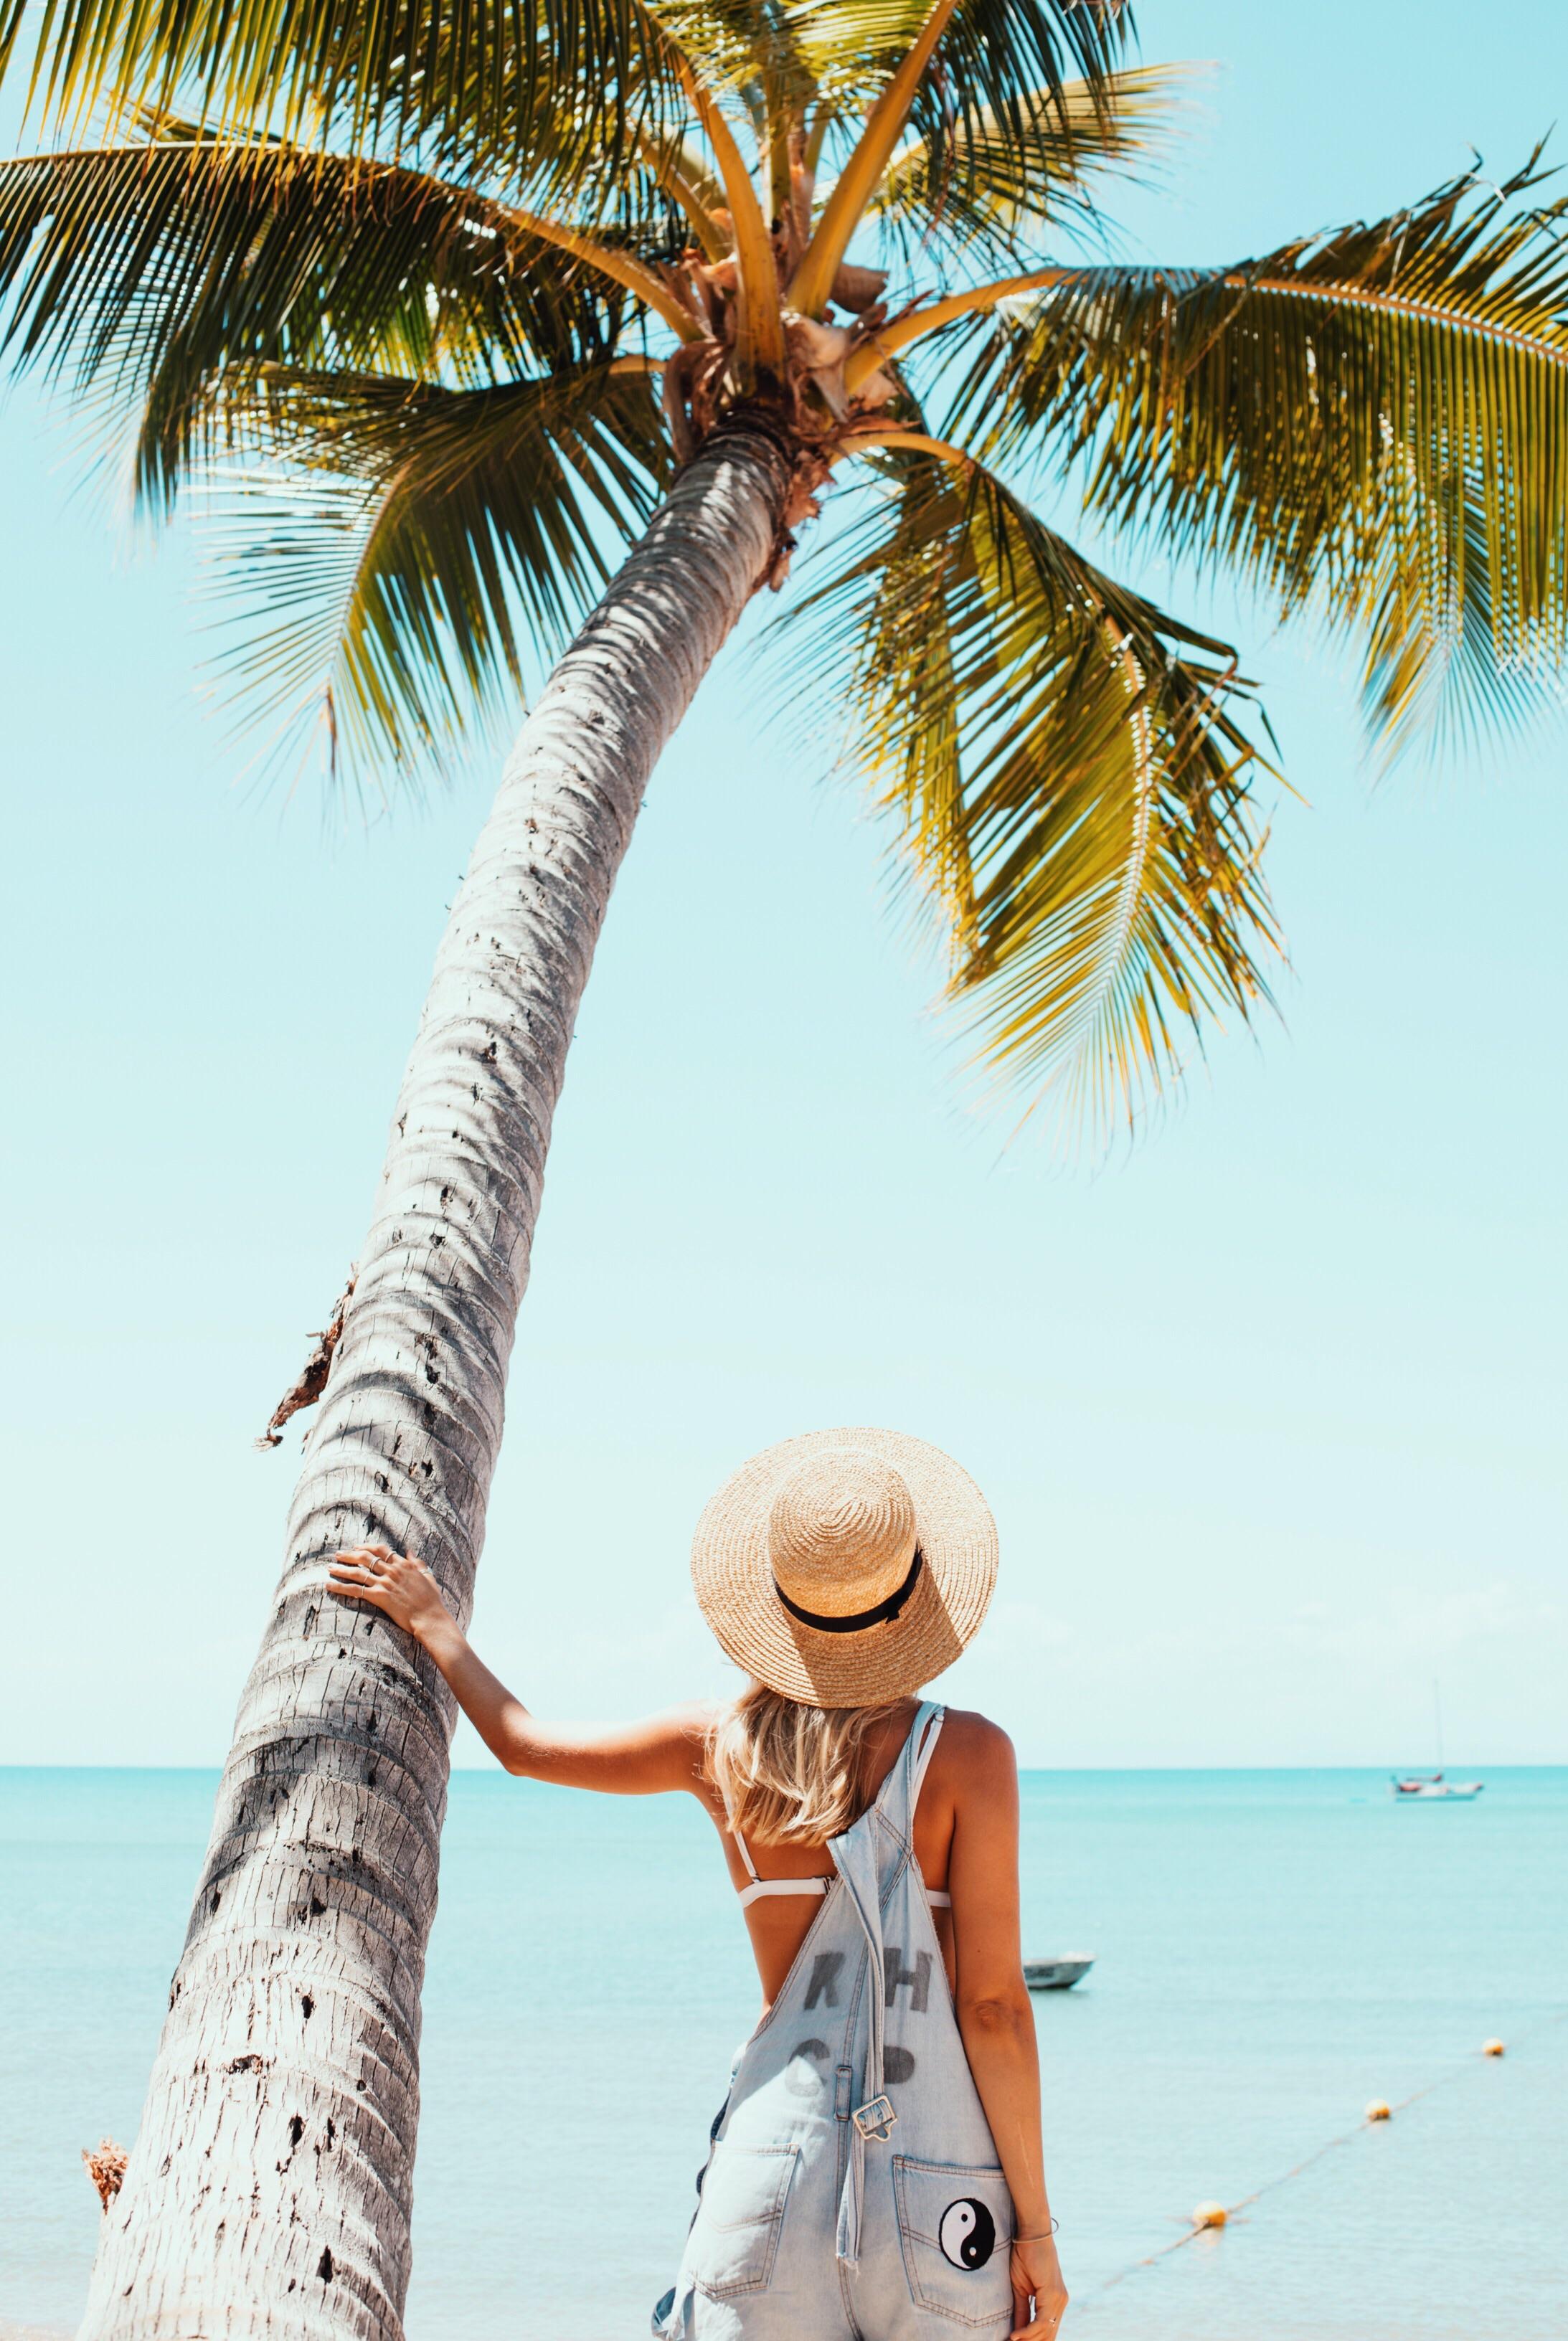 Beneath the shady palms